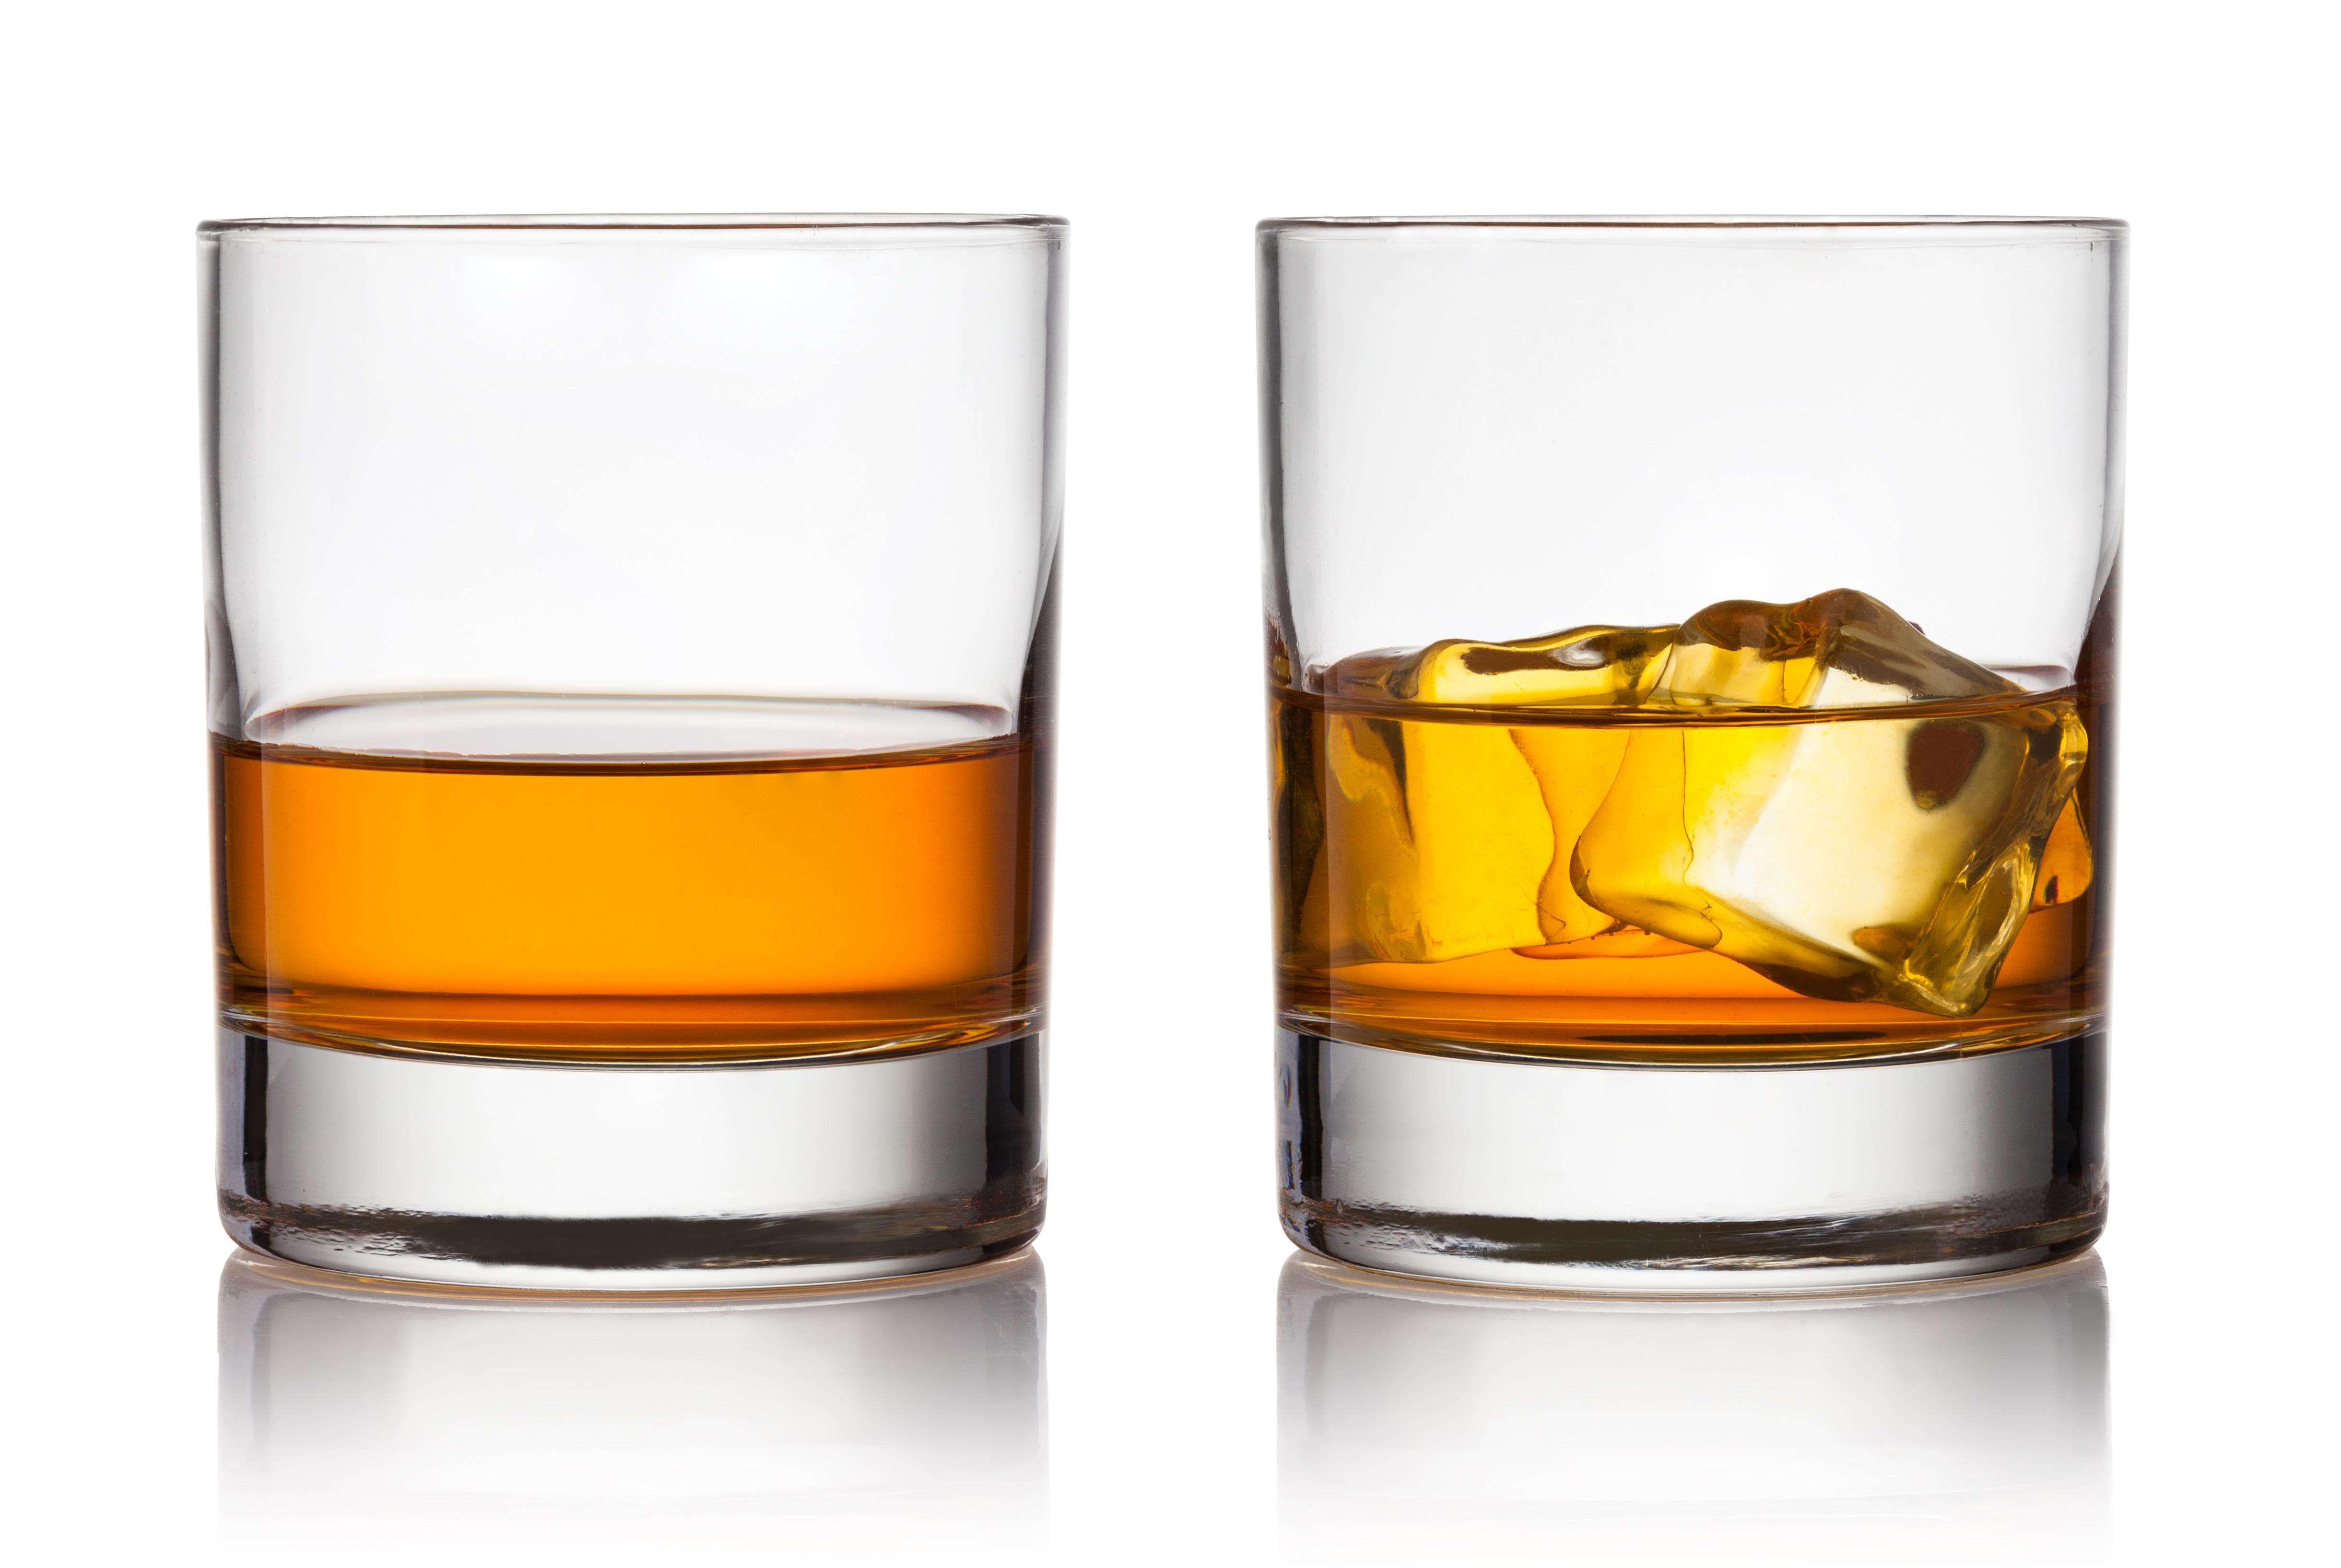 Whisky clipart scotch And Bourbon Rye The Scotch